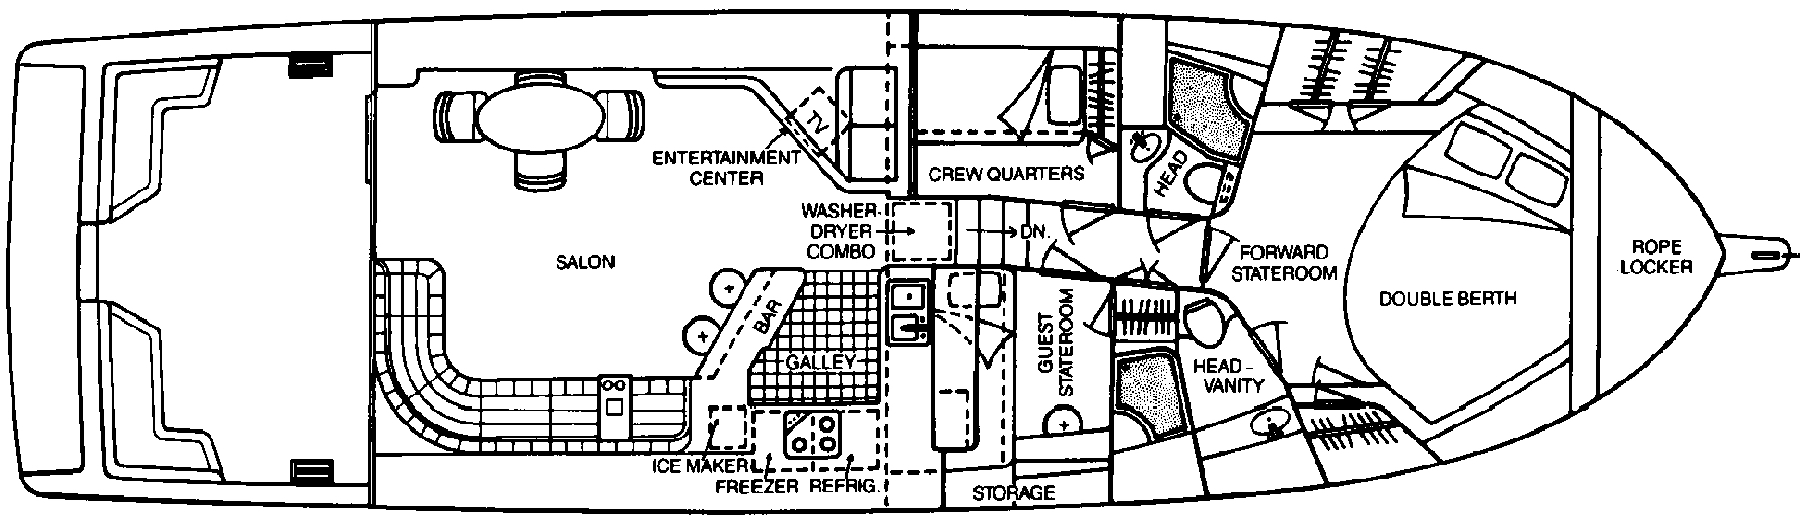 550 Sedan Bridge Floor Plan 2